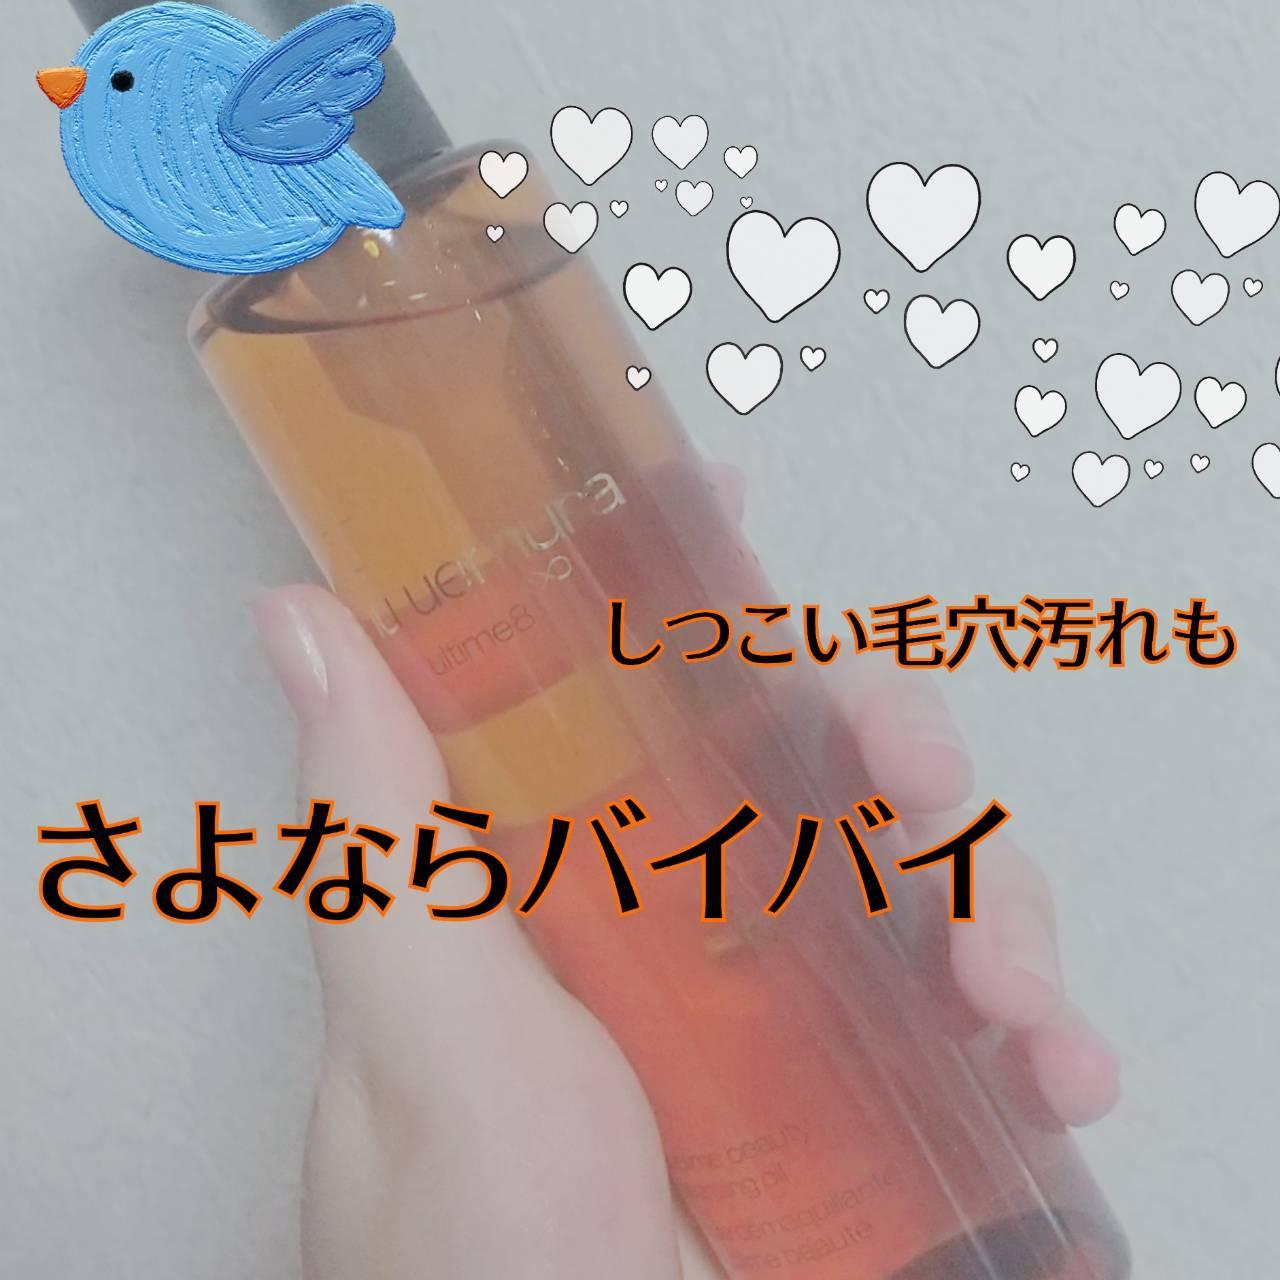 shu uemura(シュウ ウエムラ)アルティム8∞ スブリム ビューティ クレンジング オイルを使ったRIRIさんのクチコミ画像1